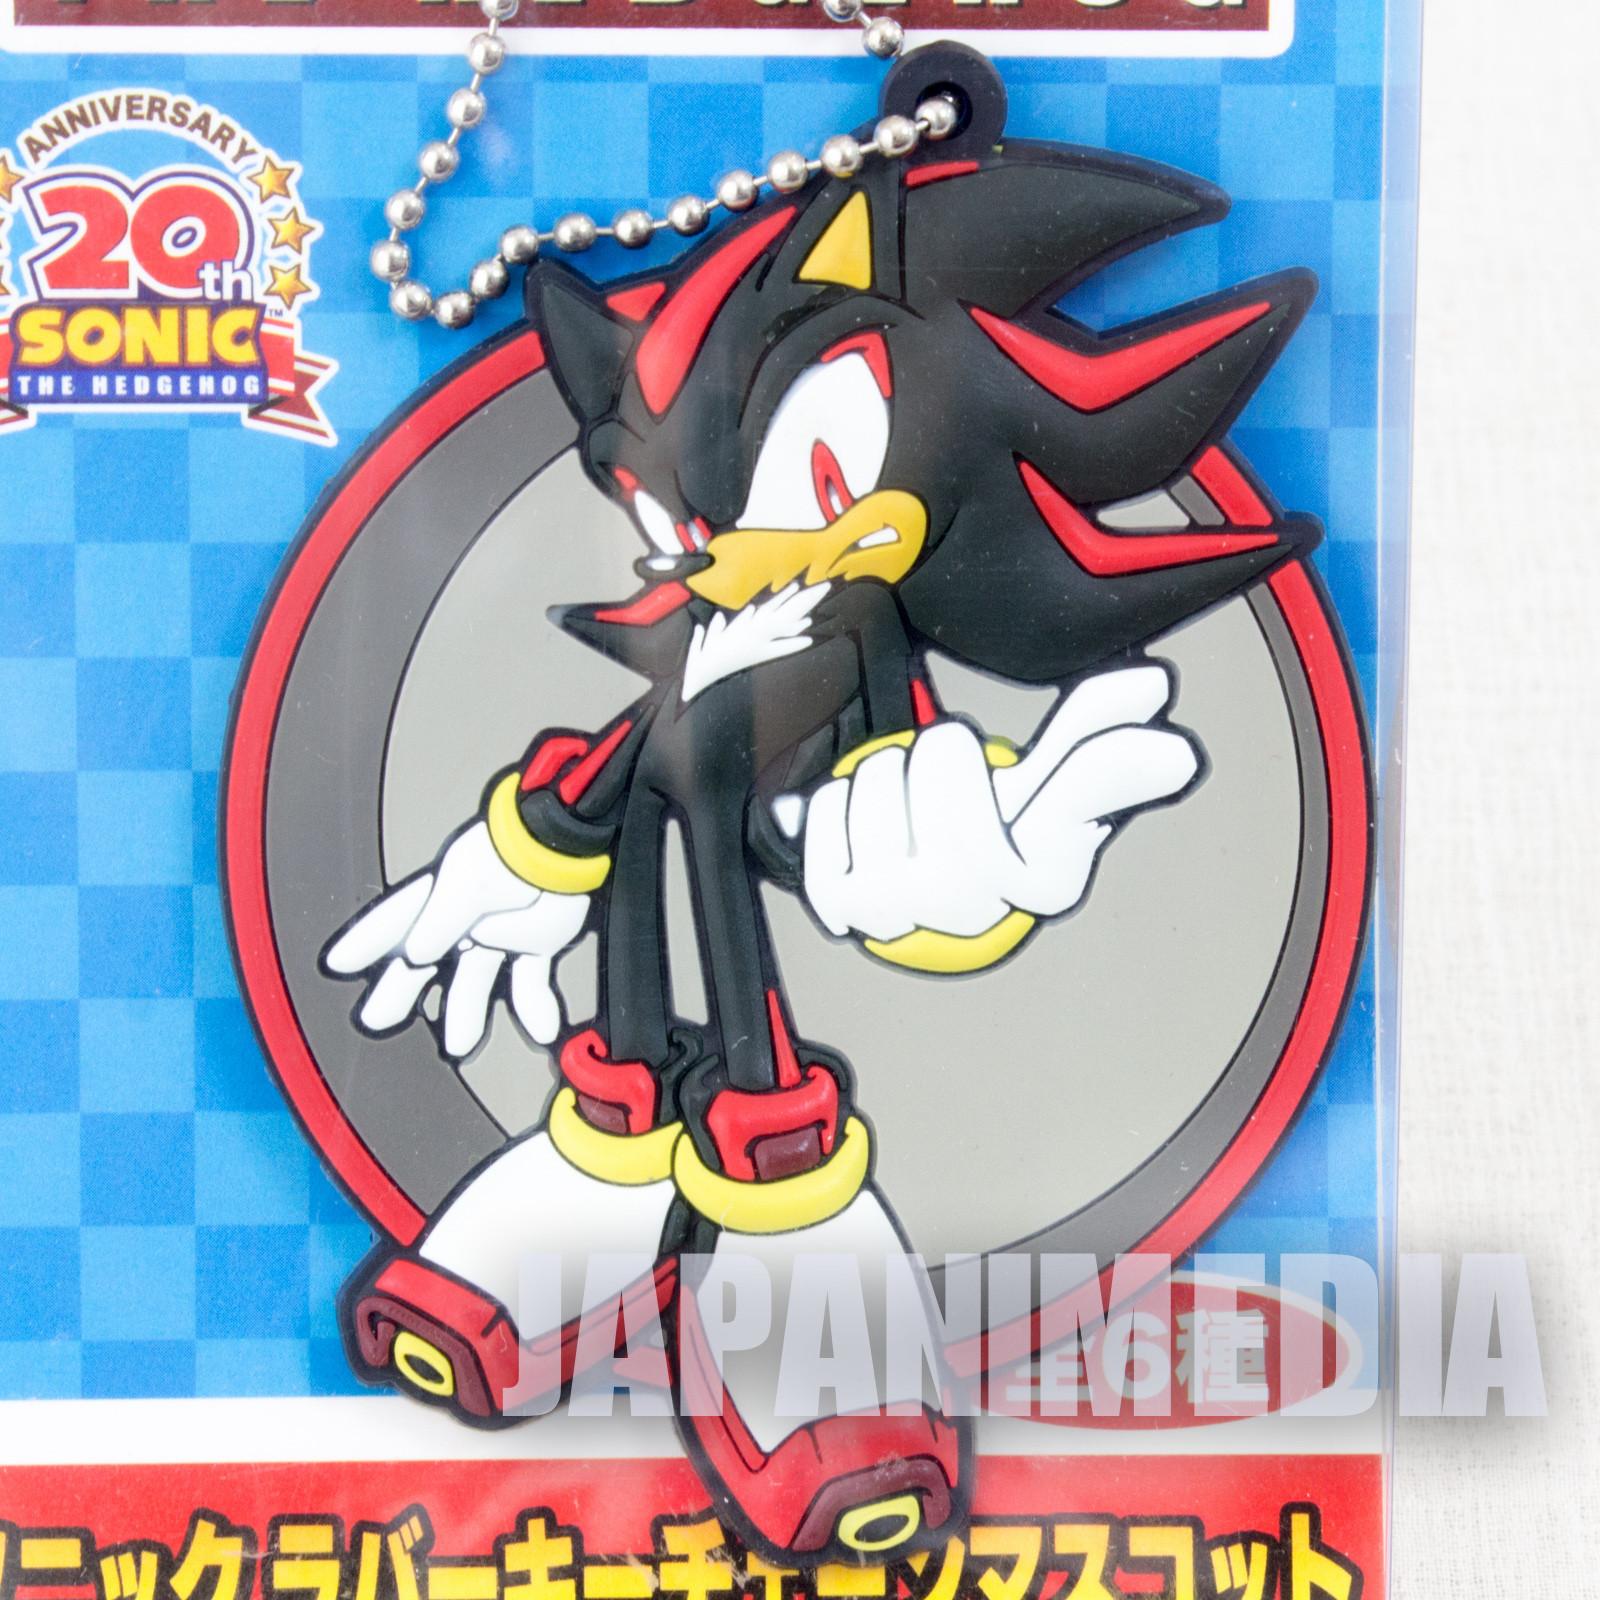 Sonic The Hedgehog Shadow 20th Anniversary Rubber Mascot SEGA JAPAN GAME